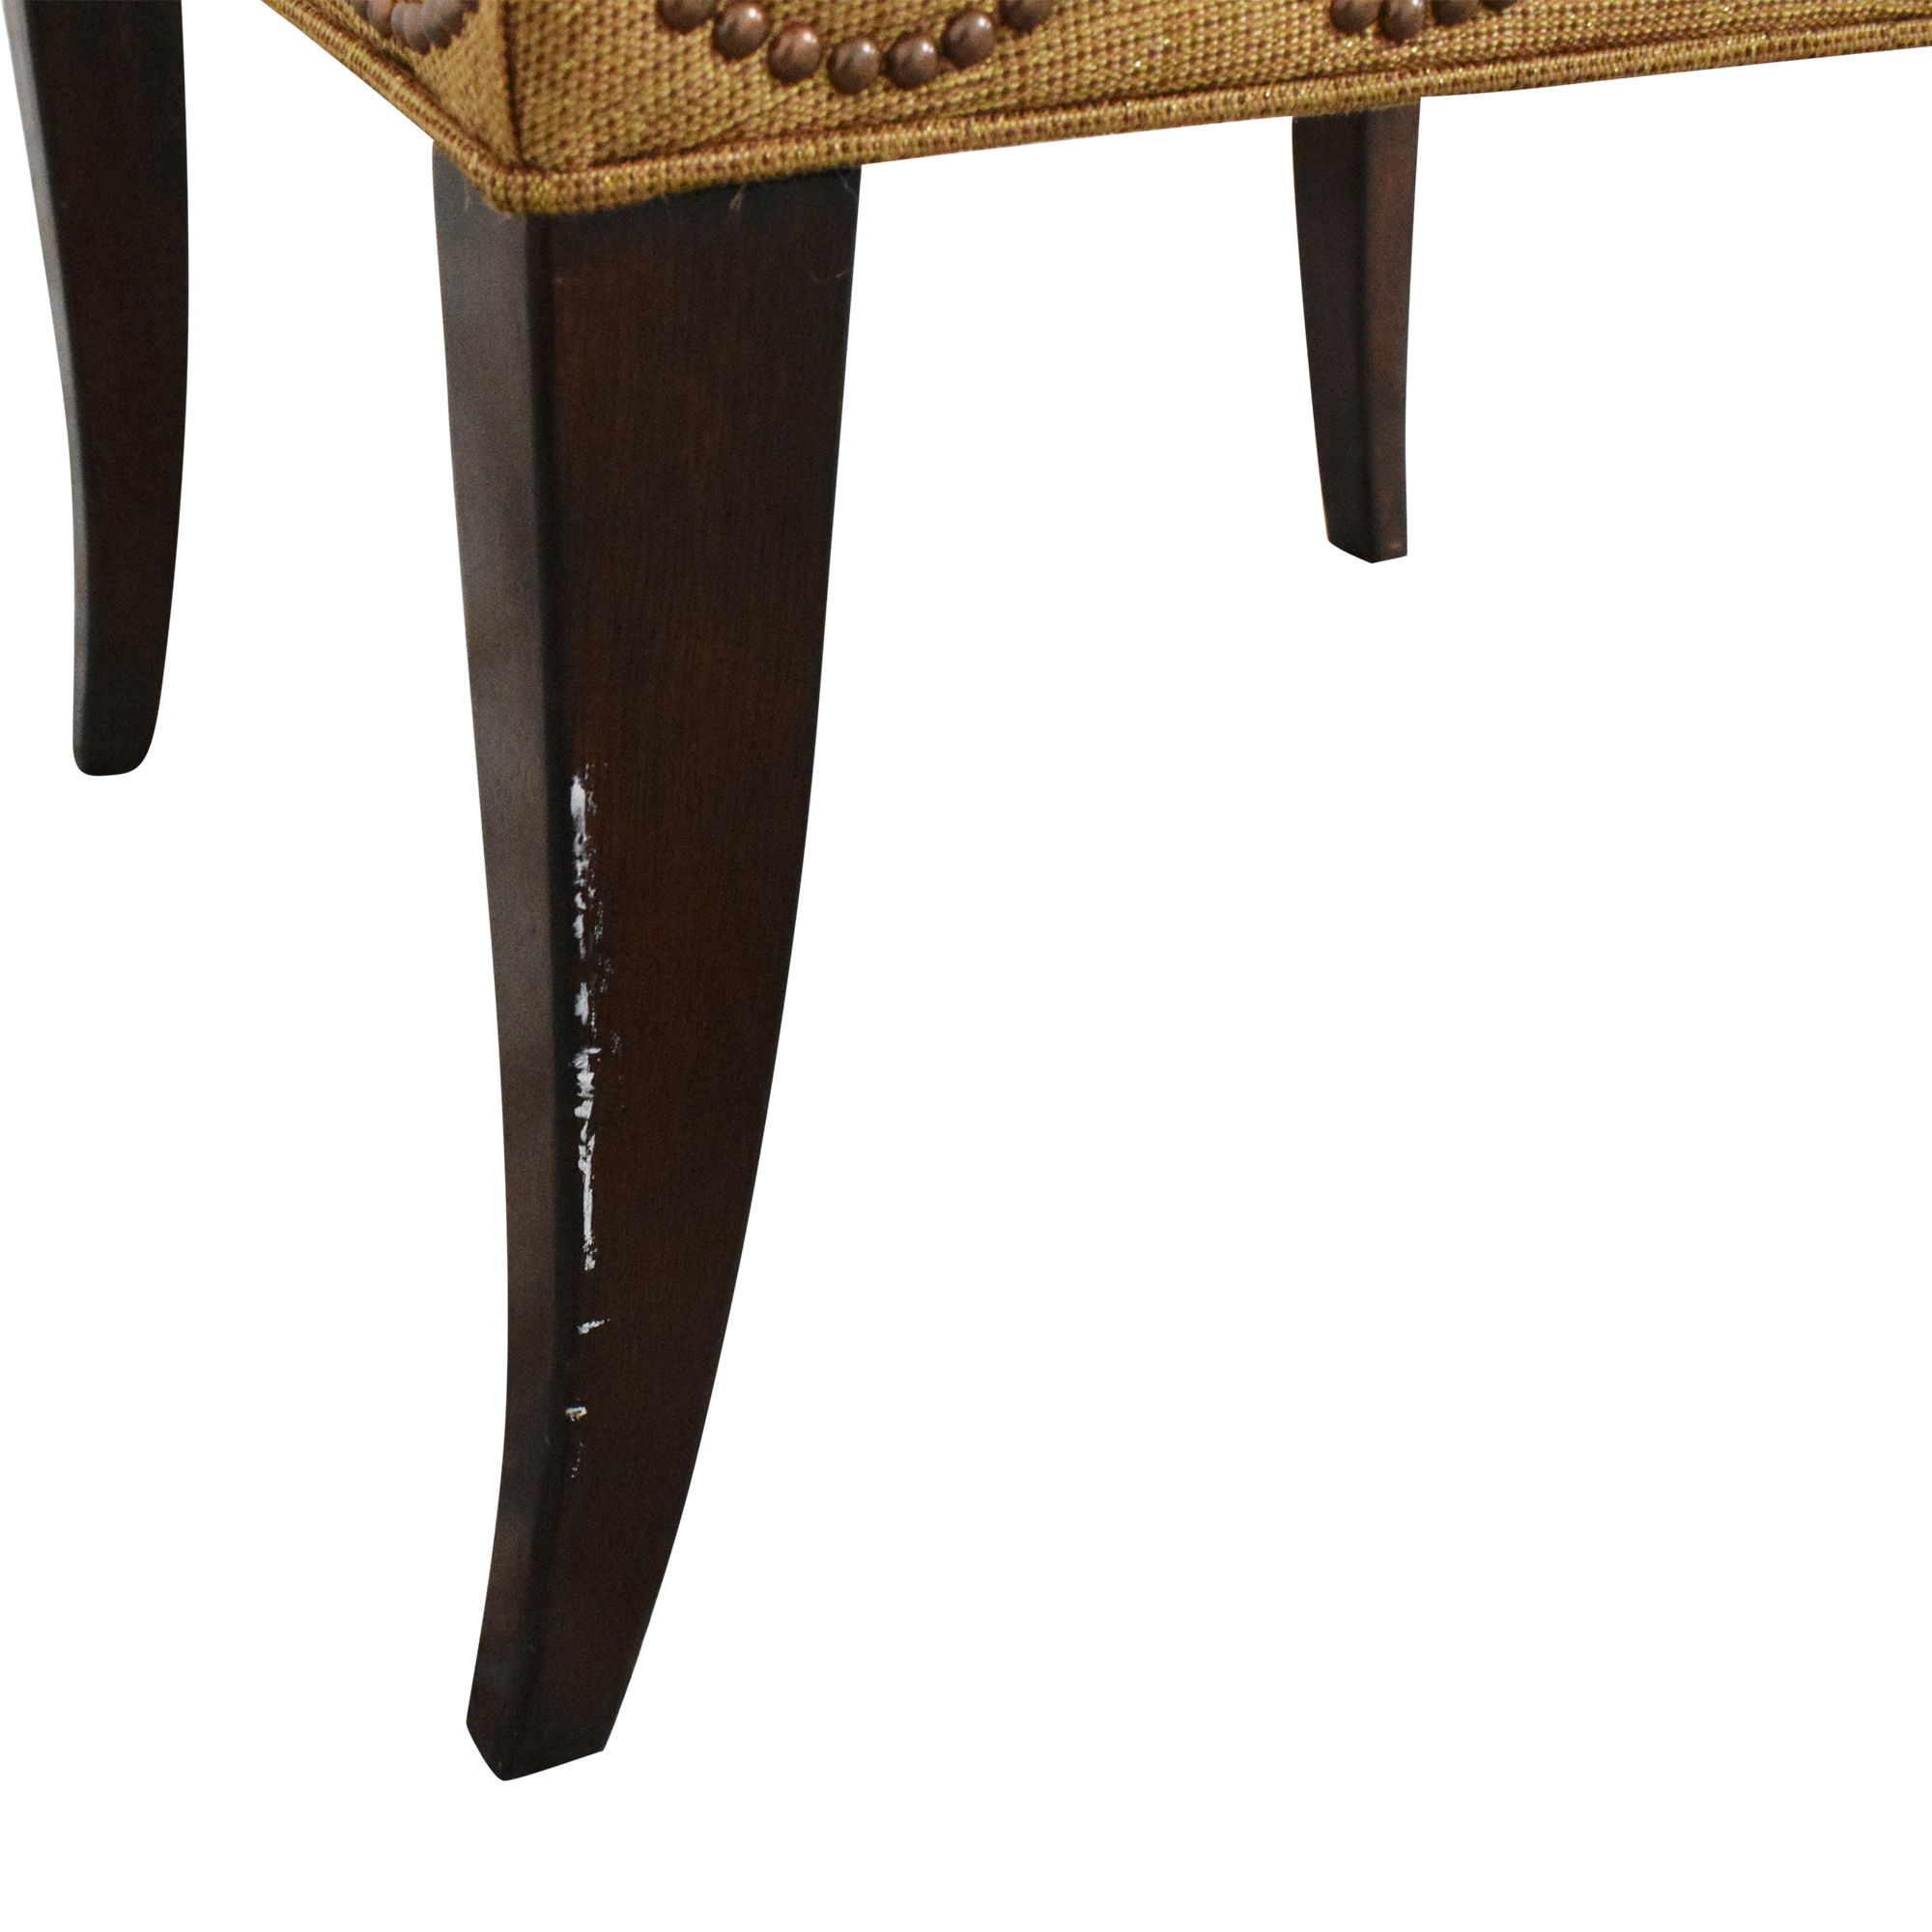 Furniture Brands International Scalloped Nailhead Dining Chairs Furniture Brands International